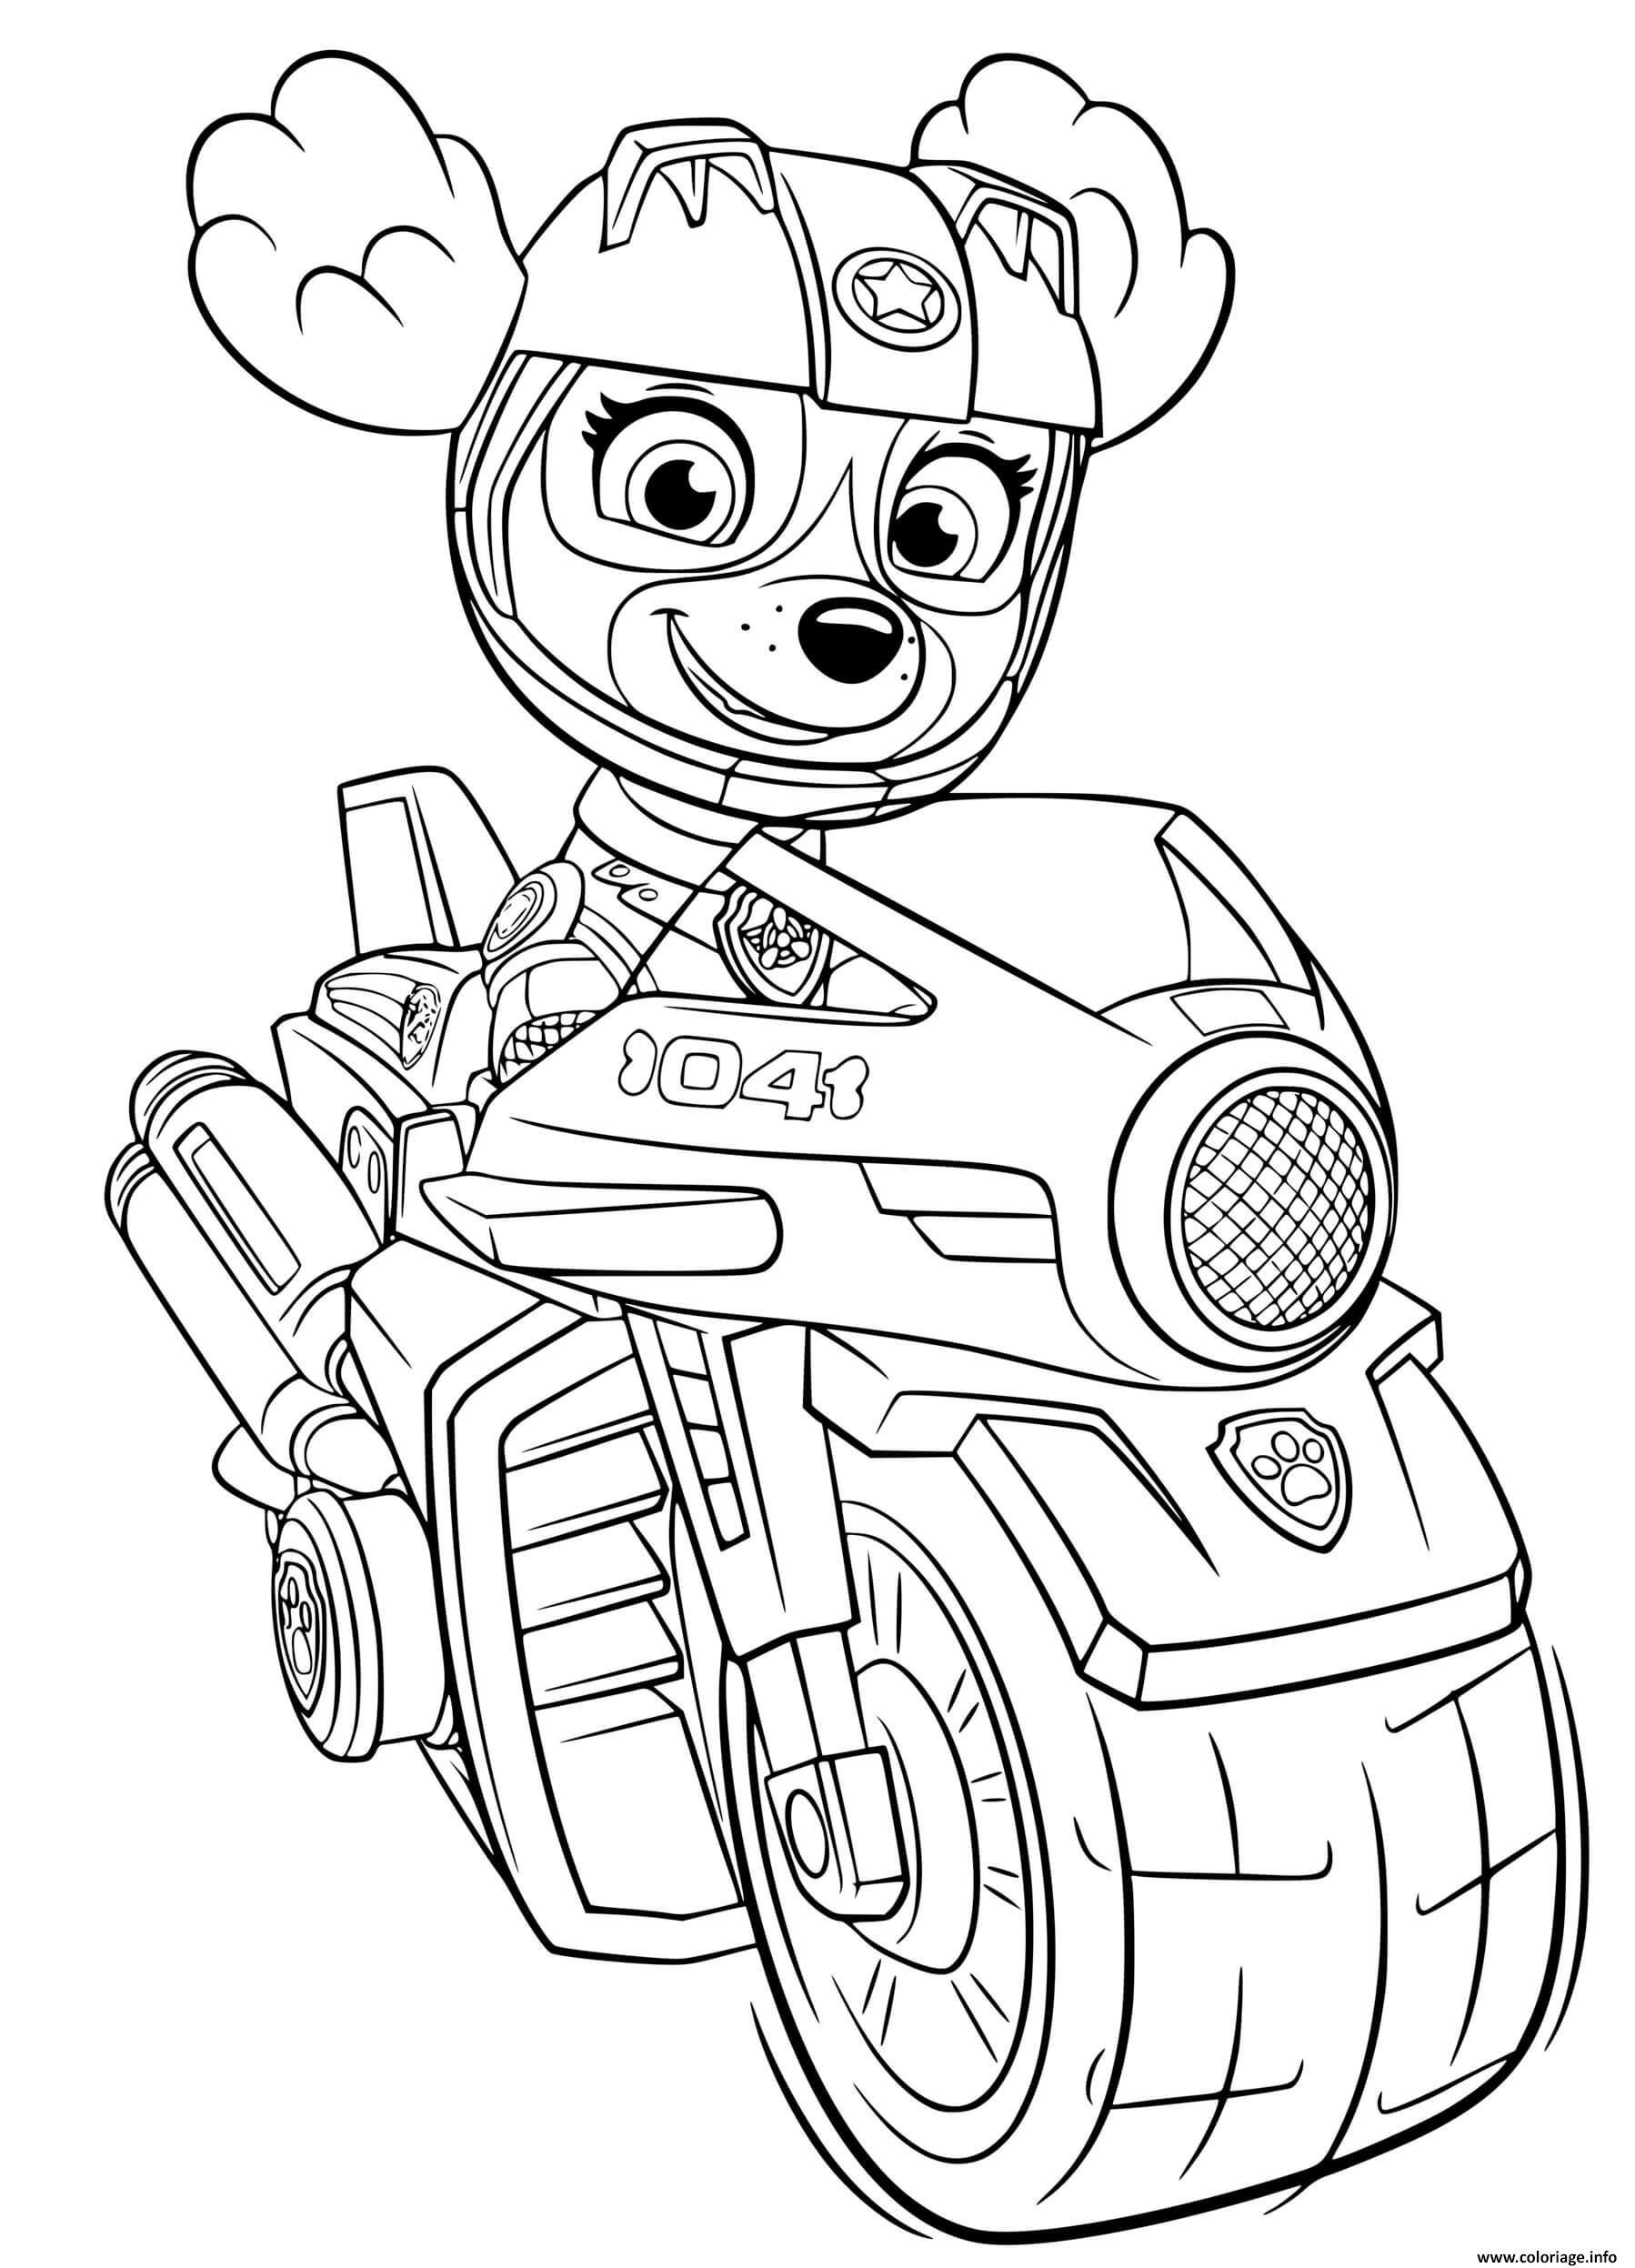 Dessin stella moto rapide sky moto pups Coloriage Gratuit à Imprimer